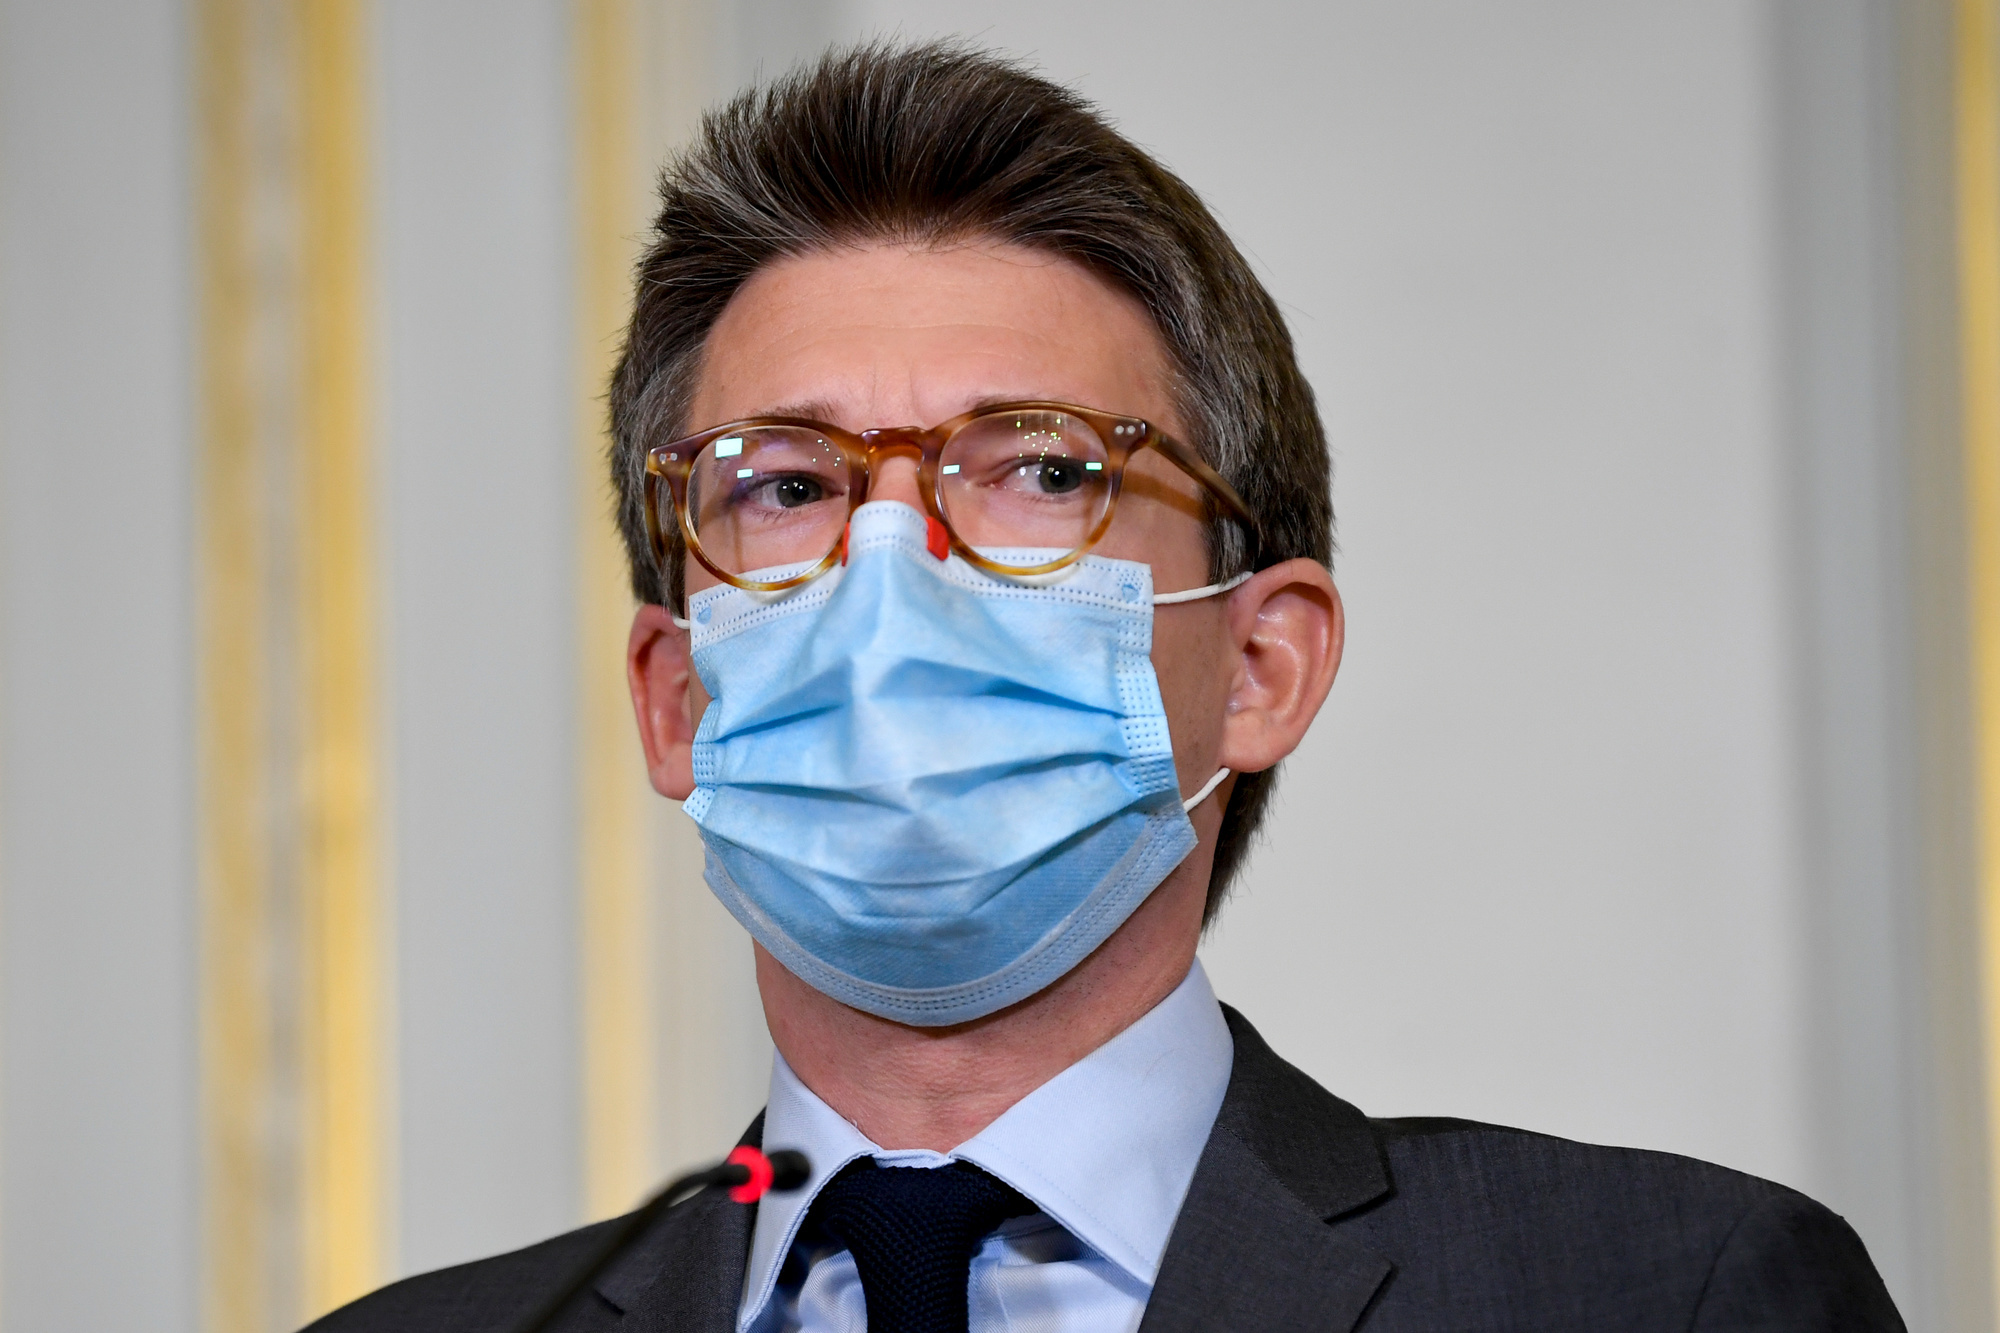 Pierre-Yves Dermagne, ministre de l'Emploi, BELGA PHOTO POOL FREDERIC SIERAKOWSKI